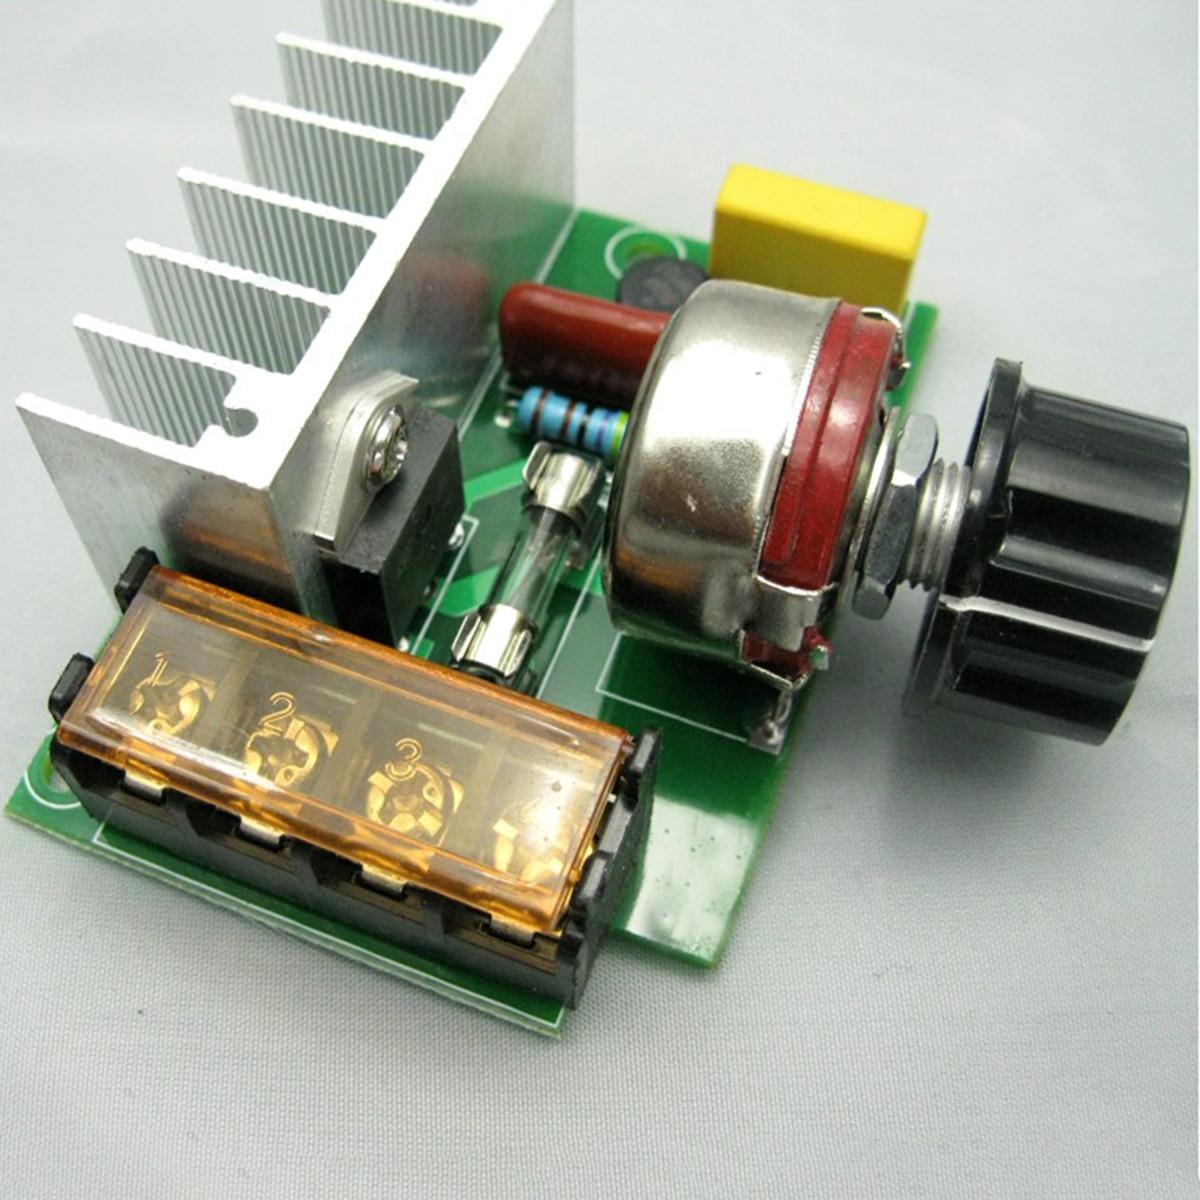 1Pc AC Regulator 4000W 220V AC SCR  Motor Speed Controller Module Voltage Regulator Dimmer For Water Heater Mayitr